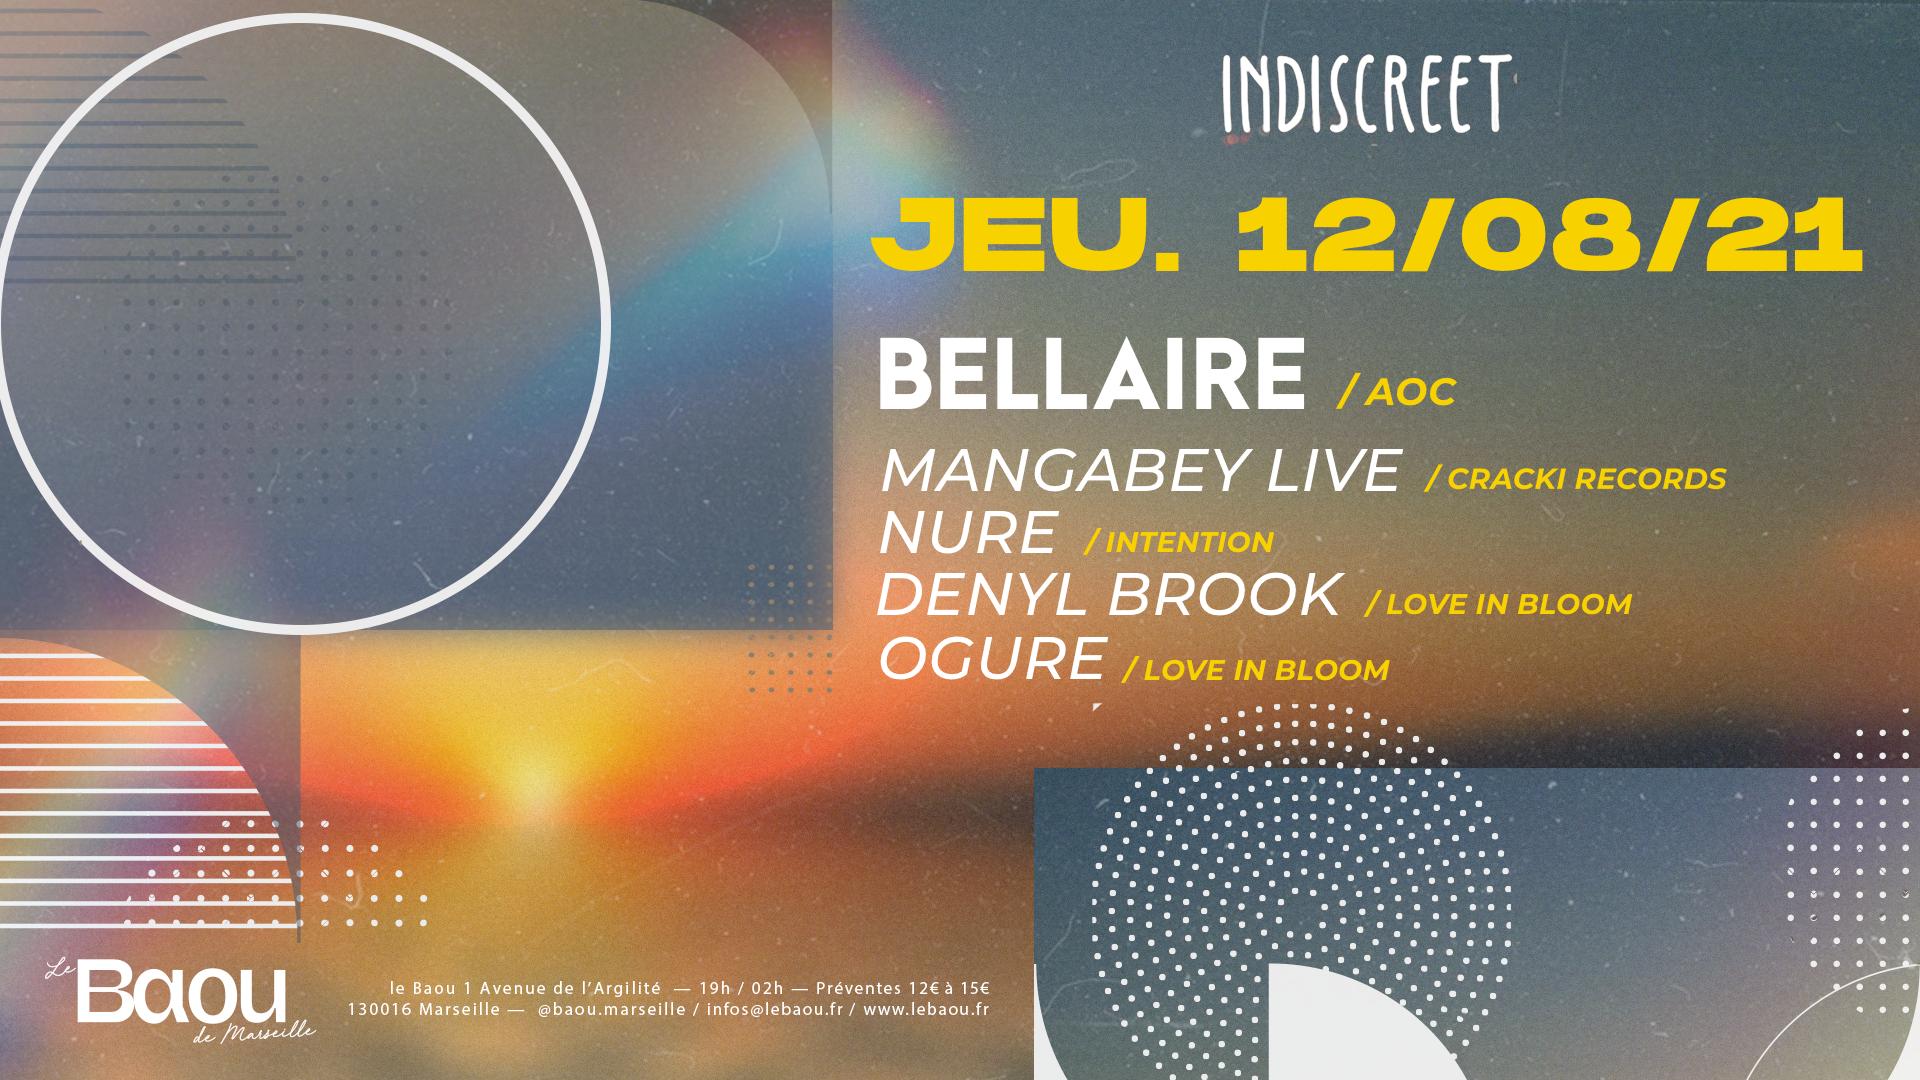 INDISCREET : Bellaire / Mangabey live / Nure / Denyl Brook / Ogure